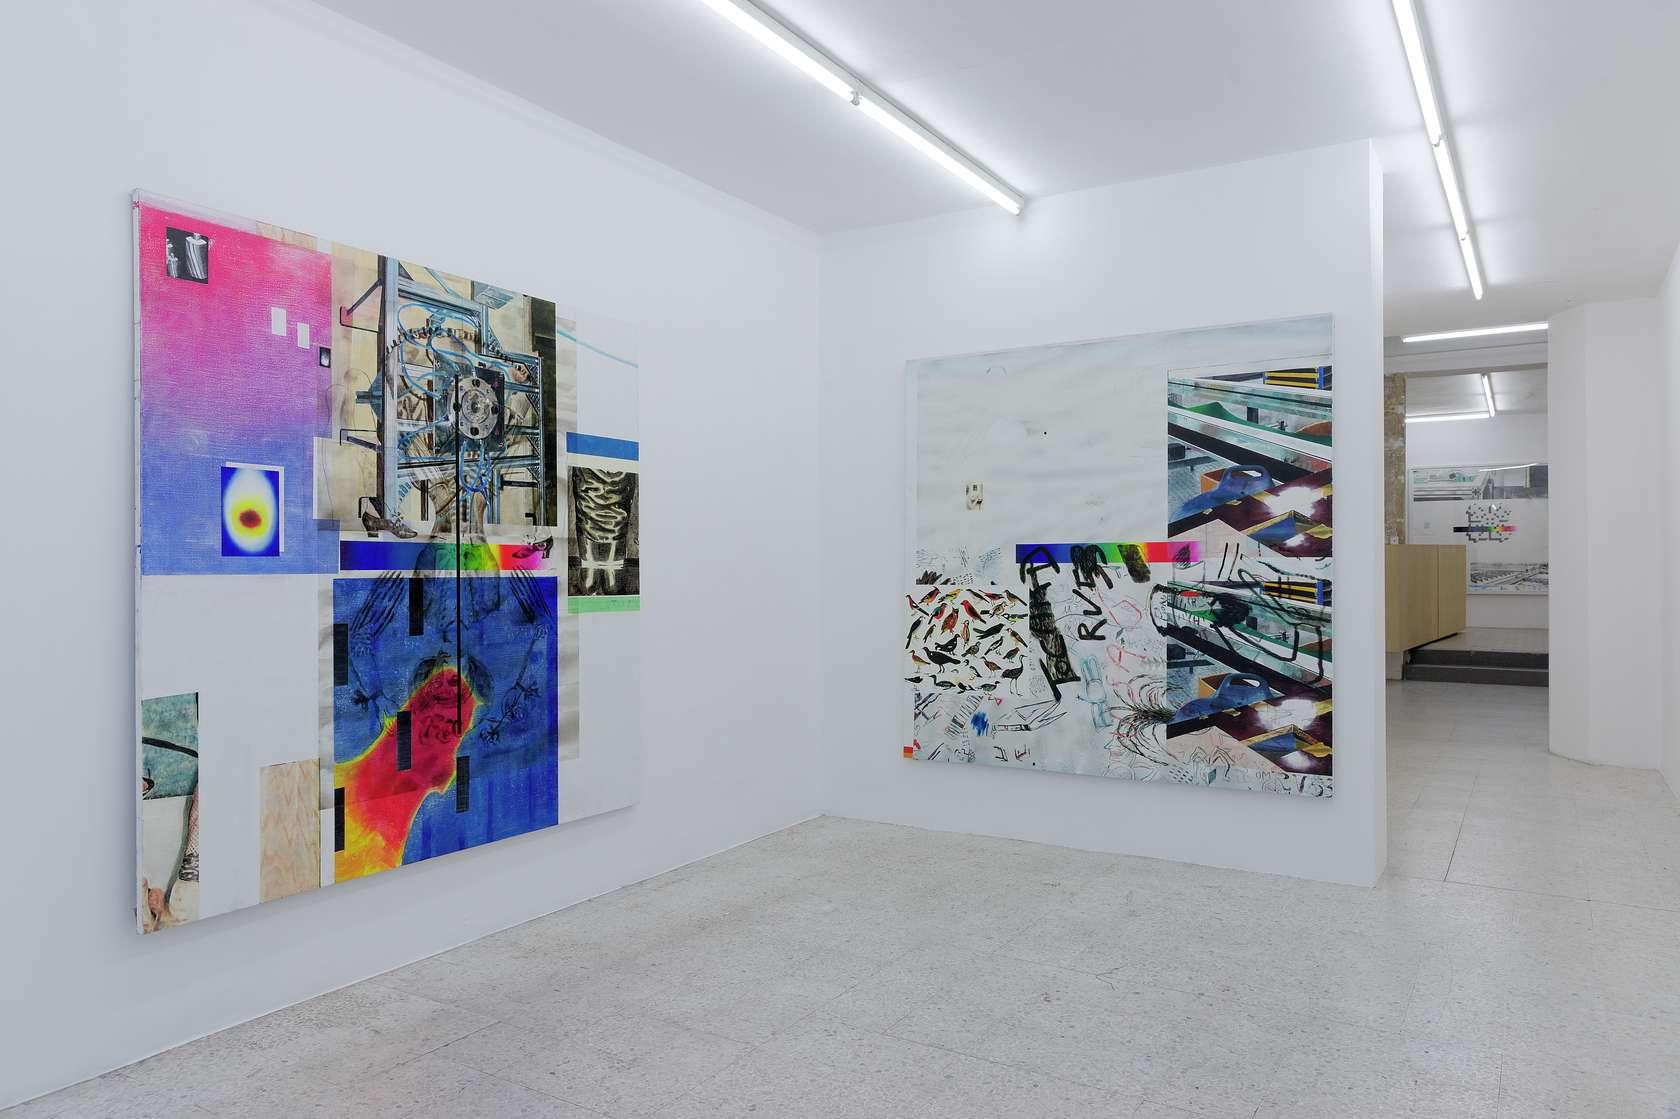 Laurent Proux,  One piece at a time 18 mai  — 15 juin 2013